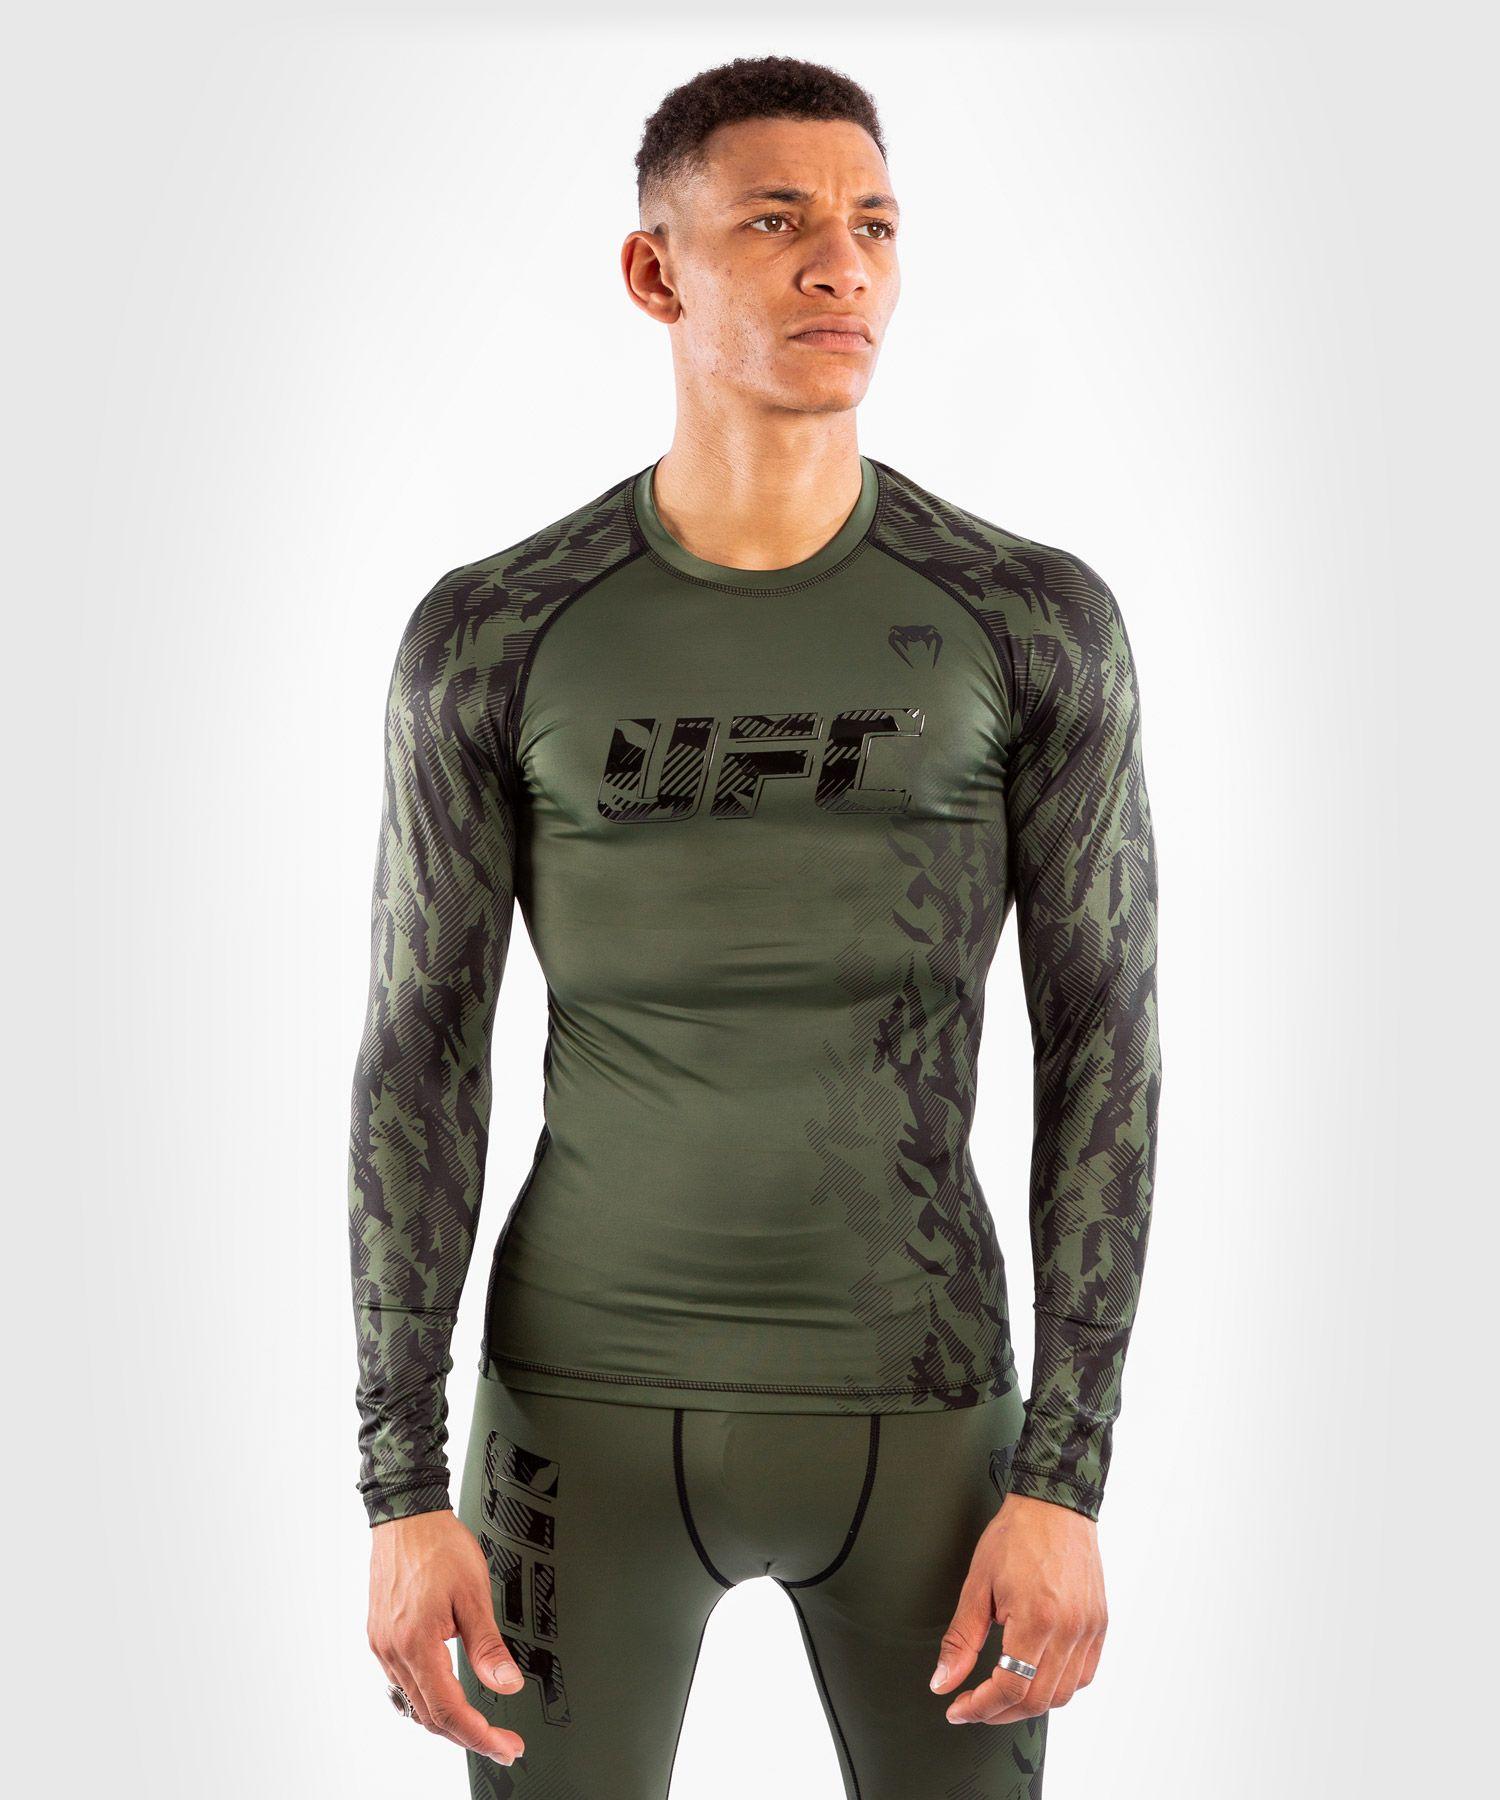 UFC Venum Authentic Fight Week Men's Performance Long Sleeve Rashguard - Khaki